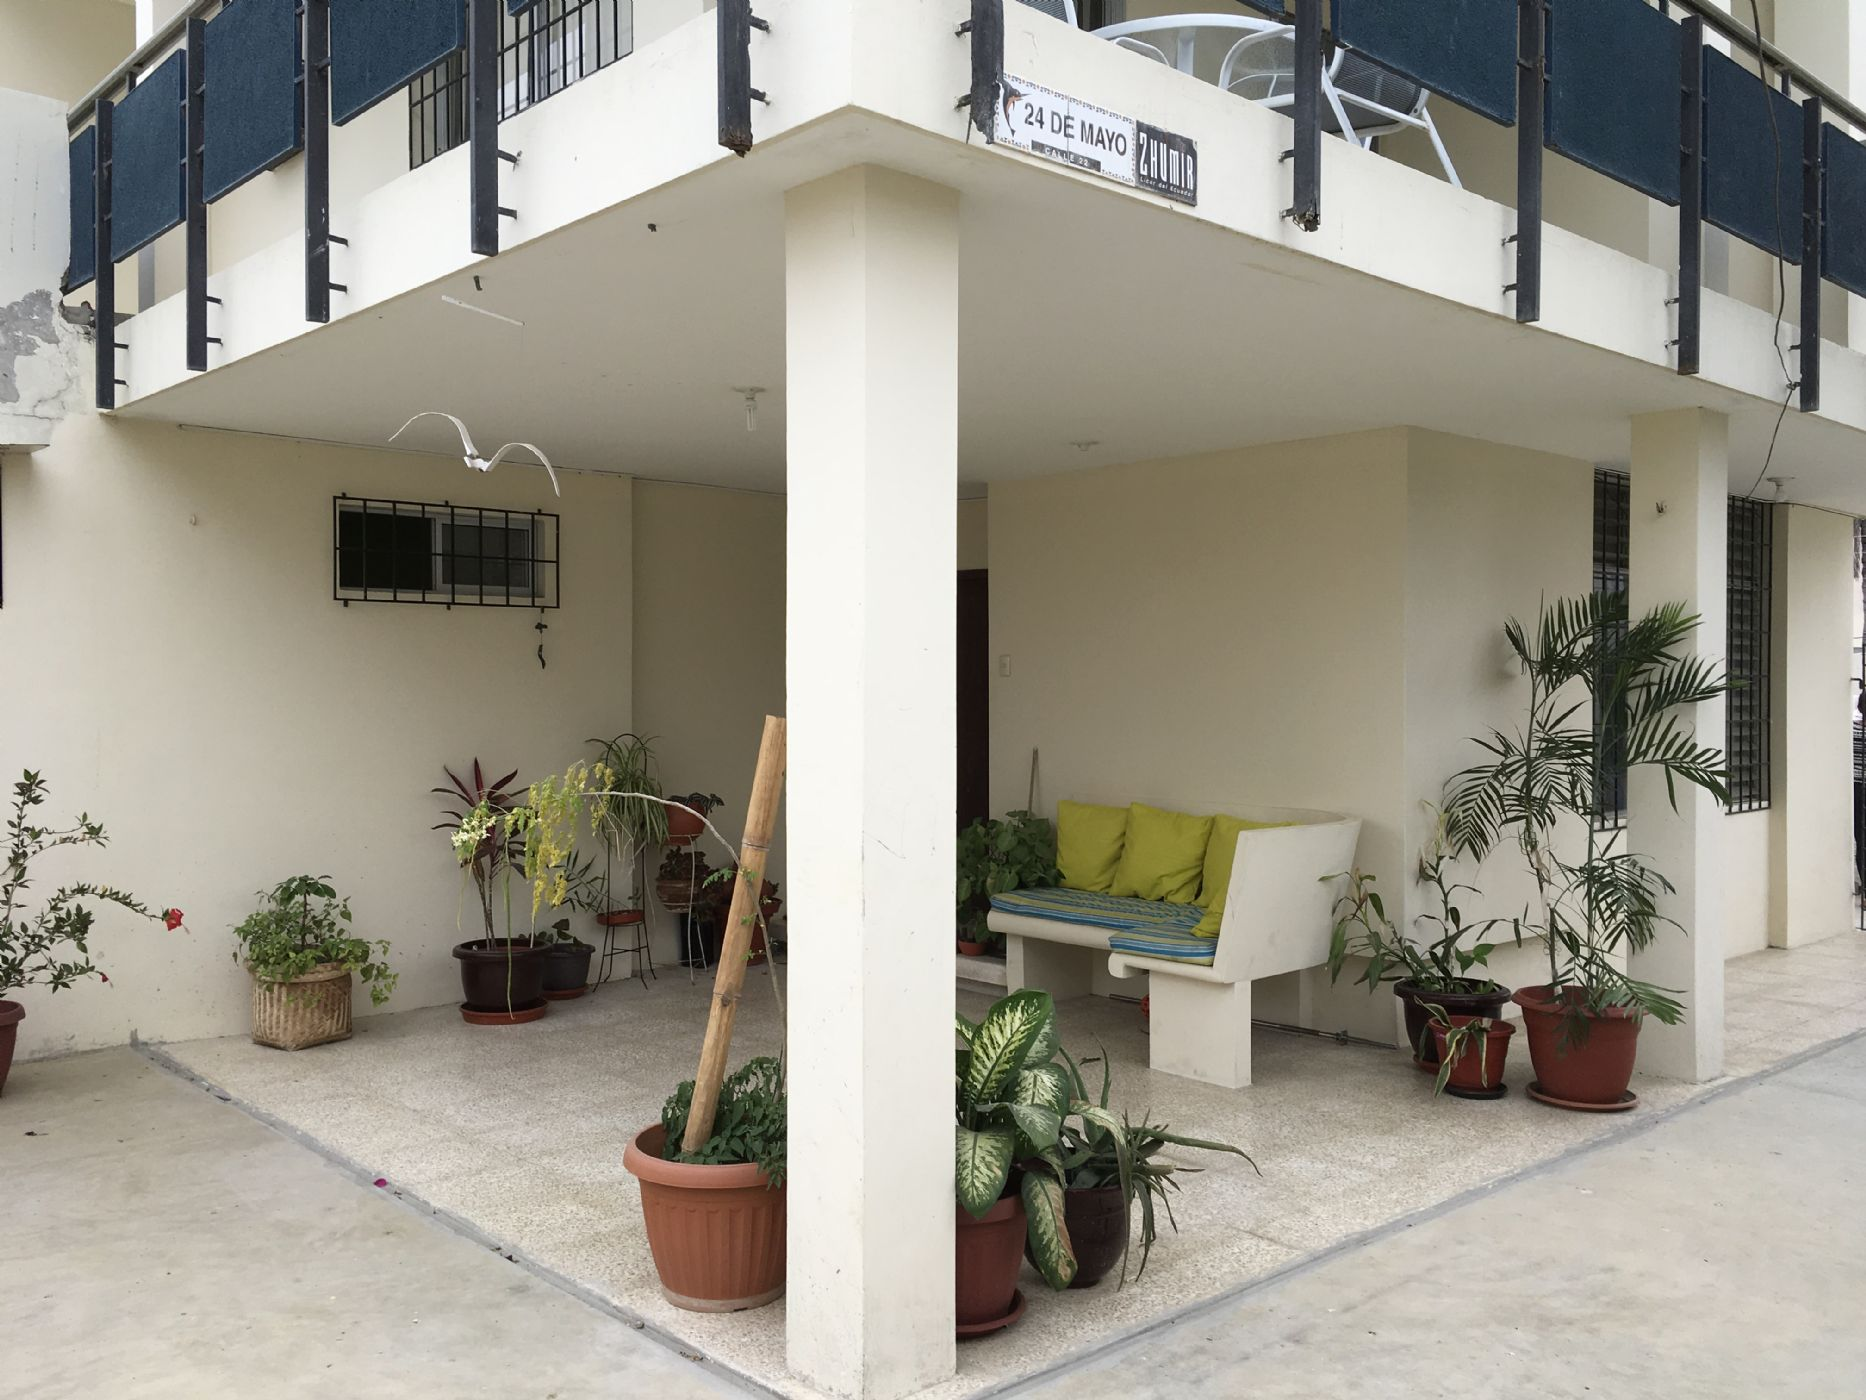 Salinas-Ecuador-property-513709-1.JPG